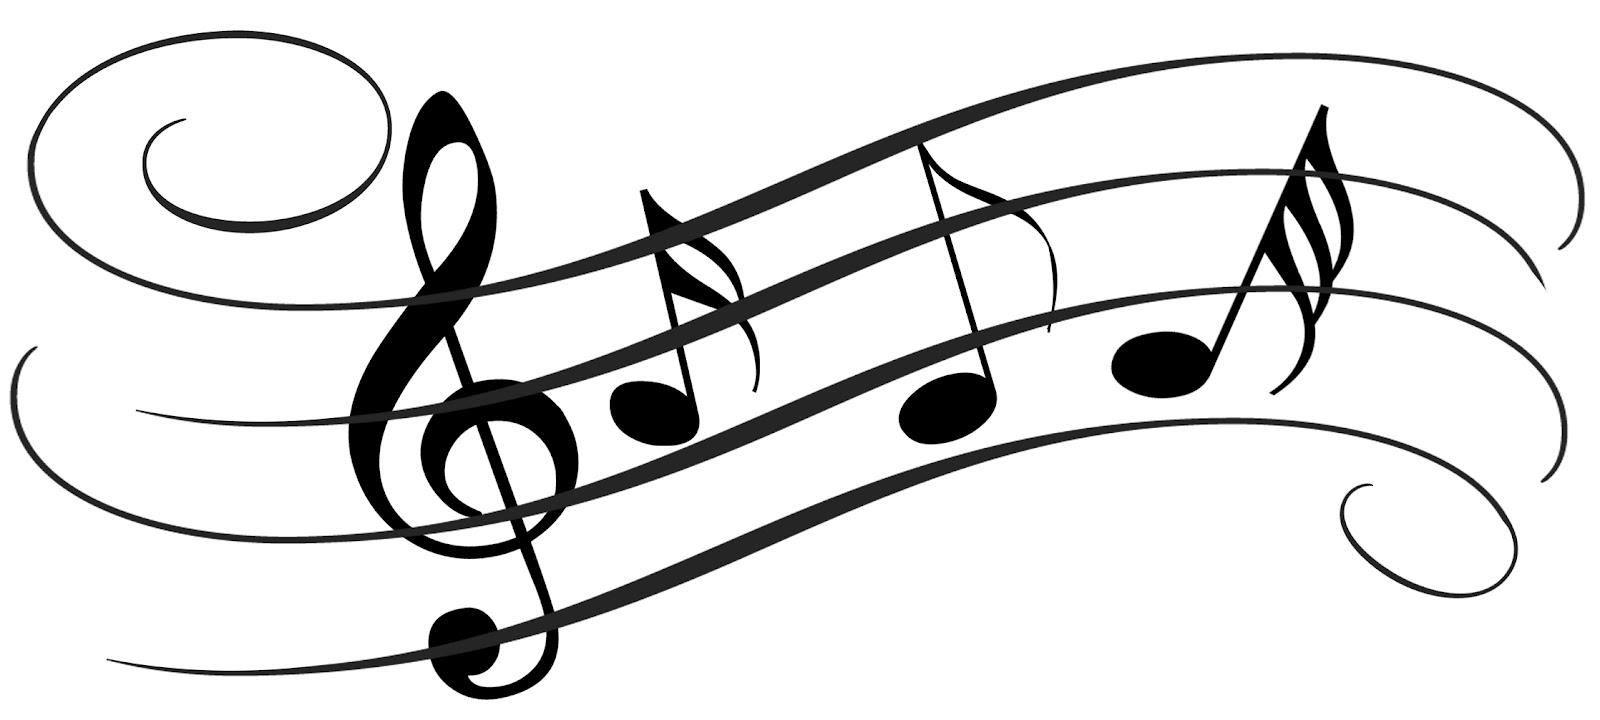 1600x720 Free Music Note Clip Art